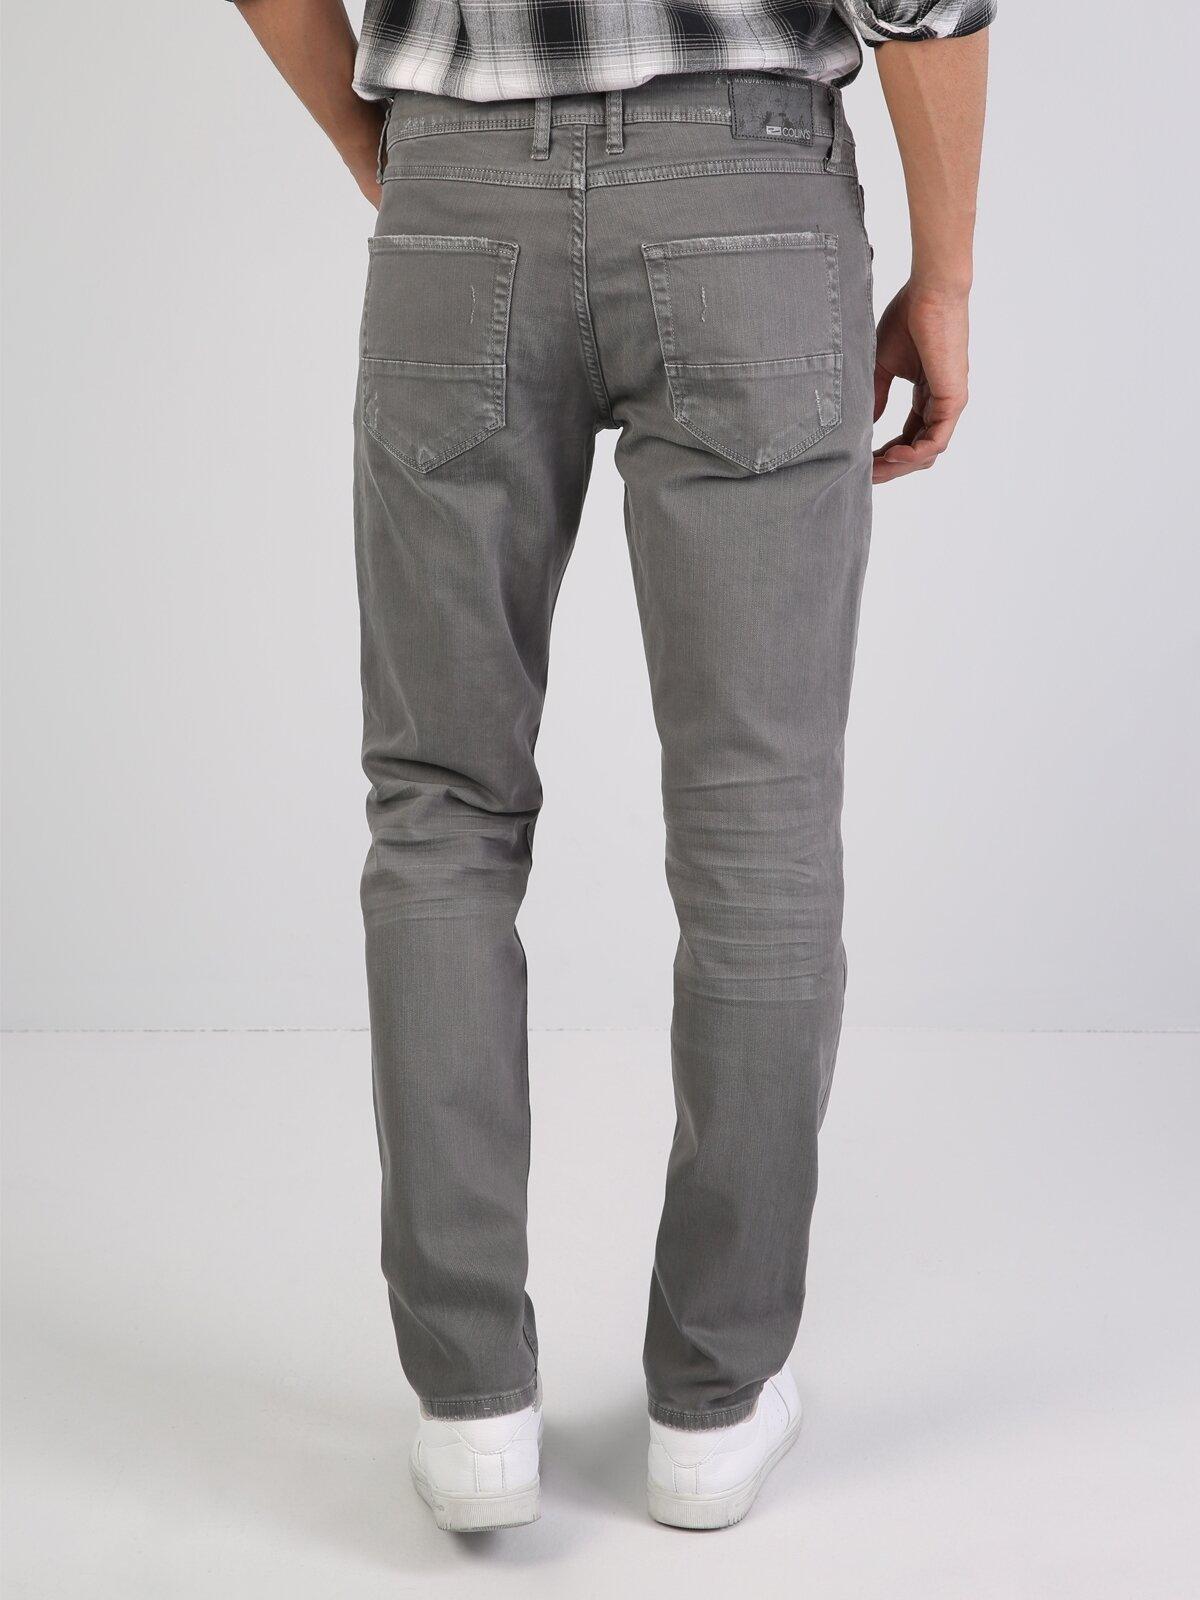 044 Karl Straight Fit Orta Bel Düz Paça  Erkek Açık Gri Pantolon